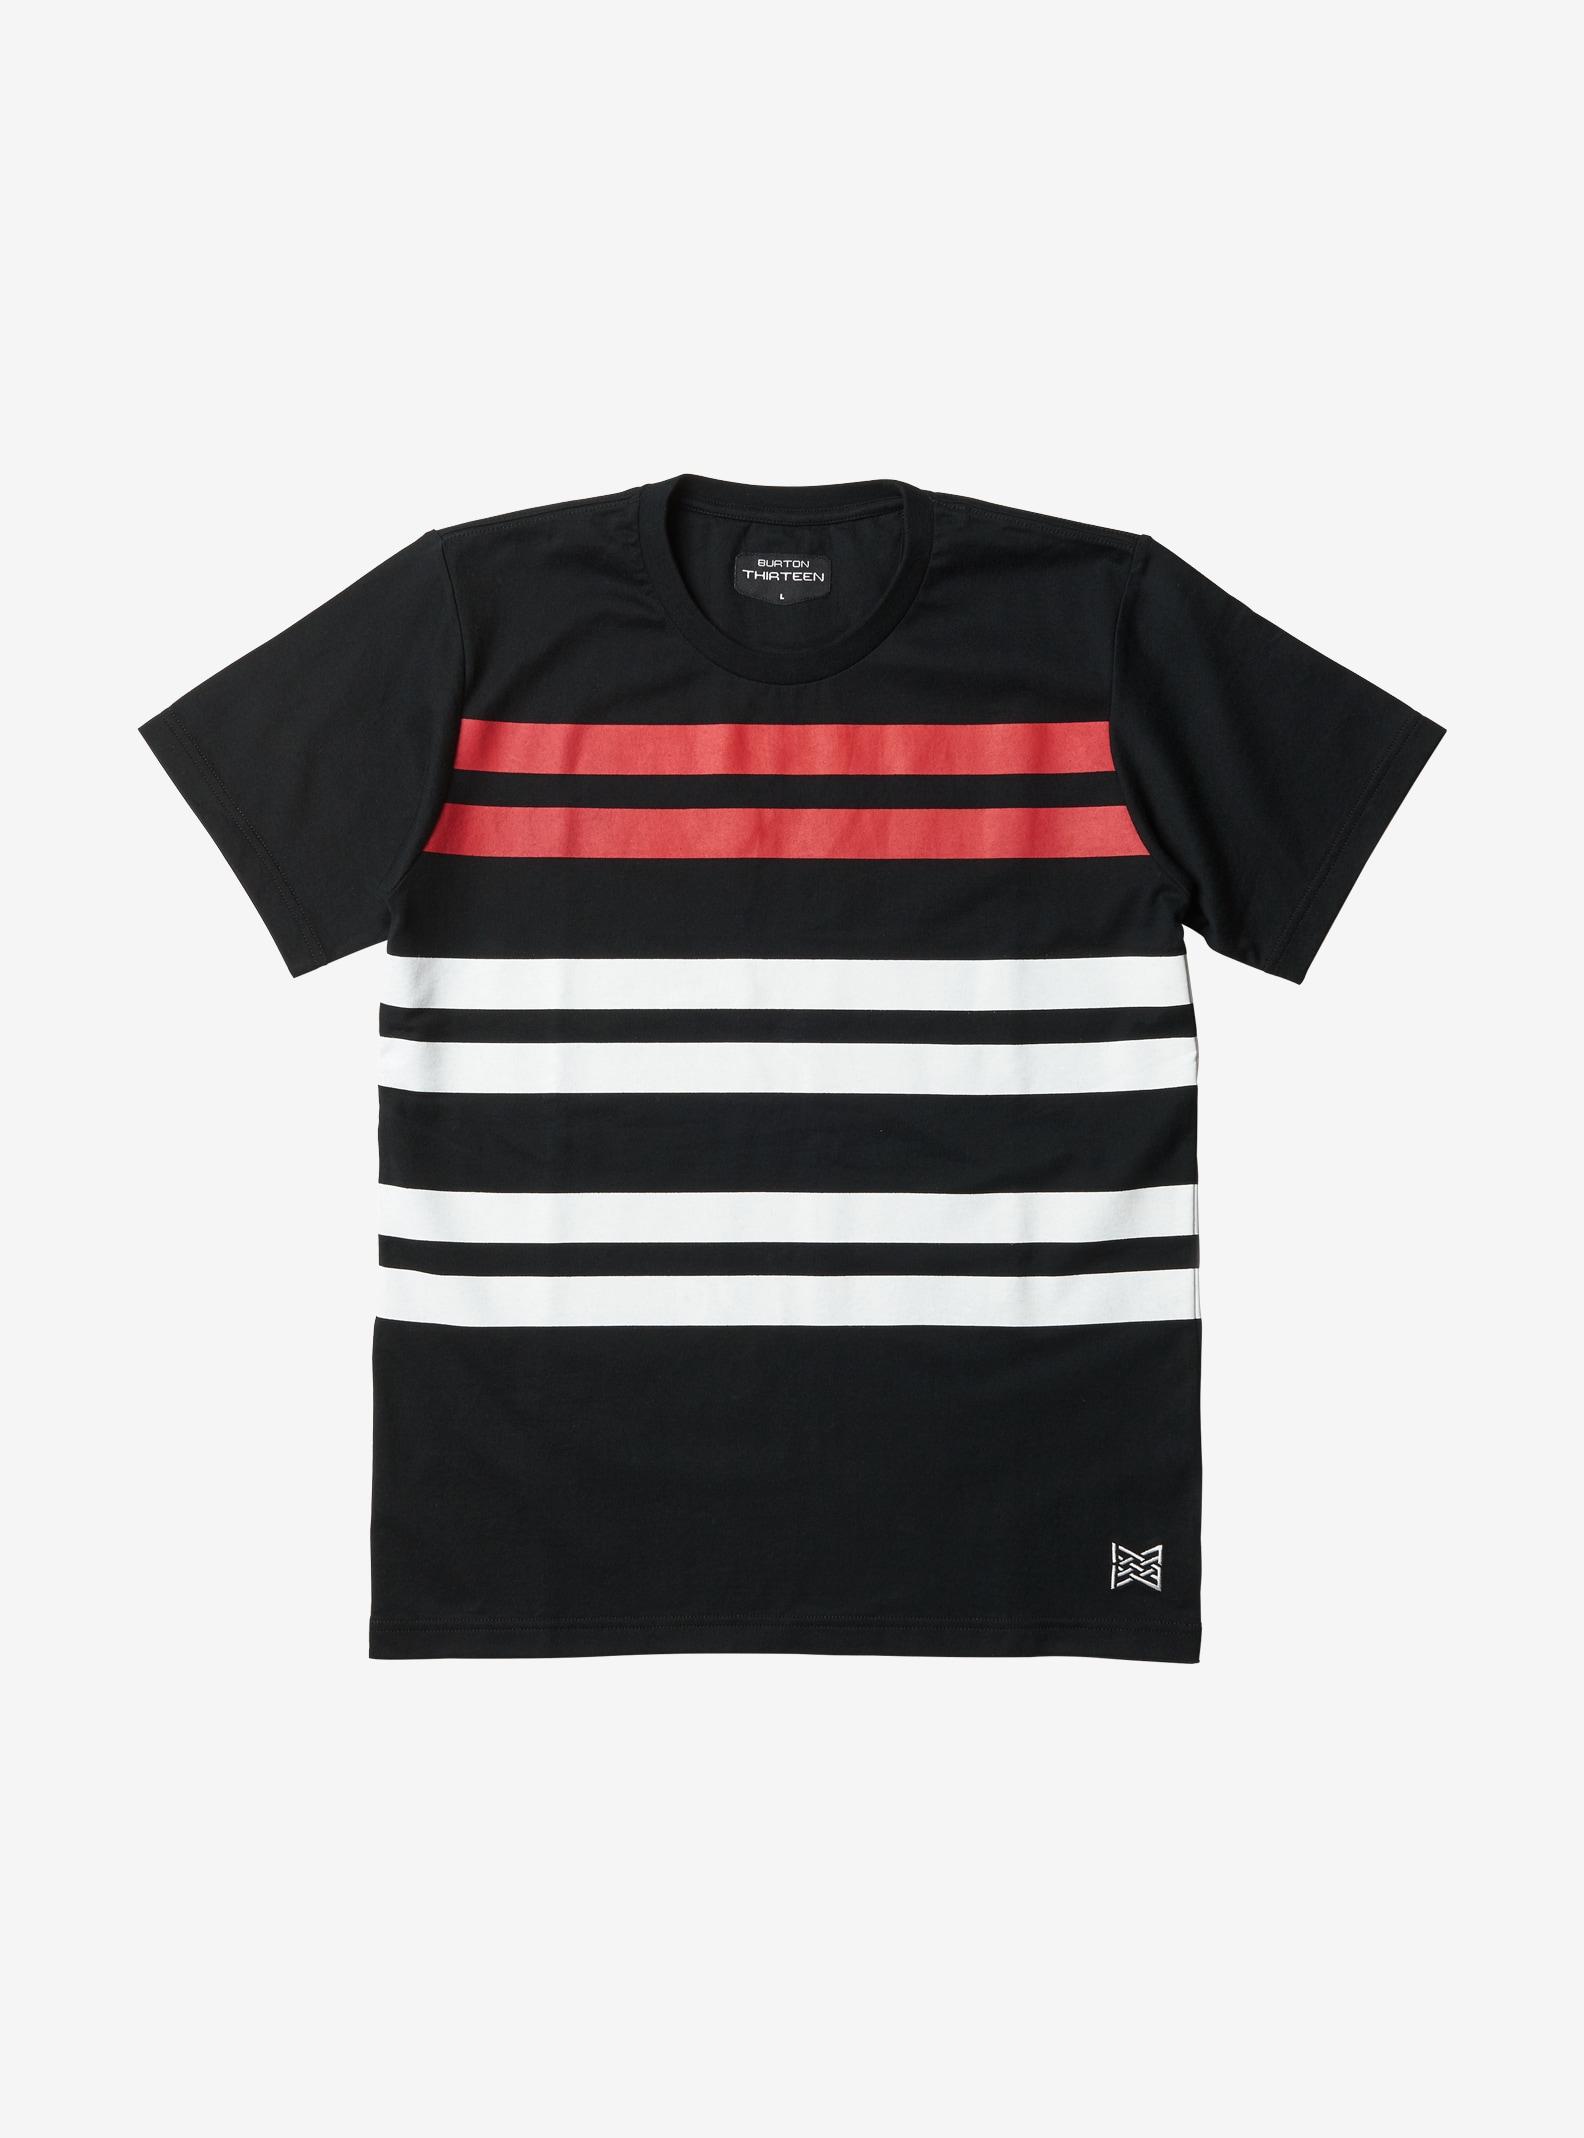 Burton Thirteen Ceto Short Sleeve T Shirt shown in Black